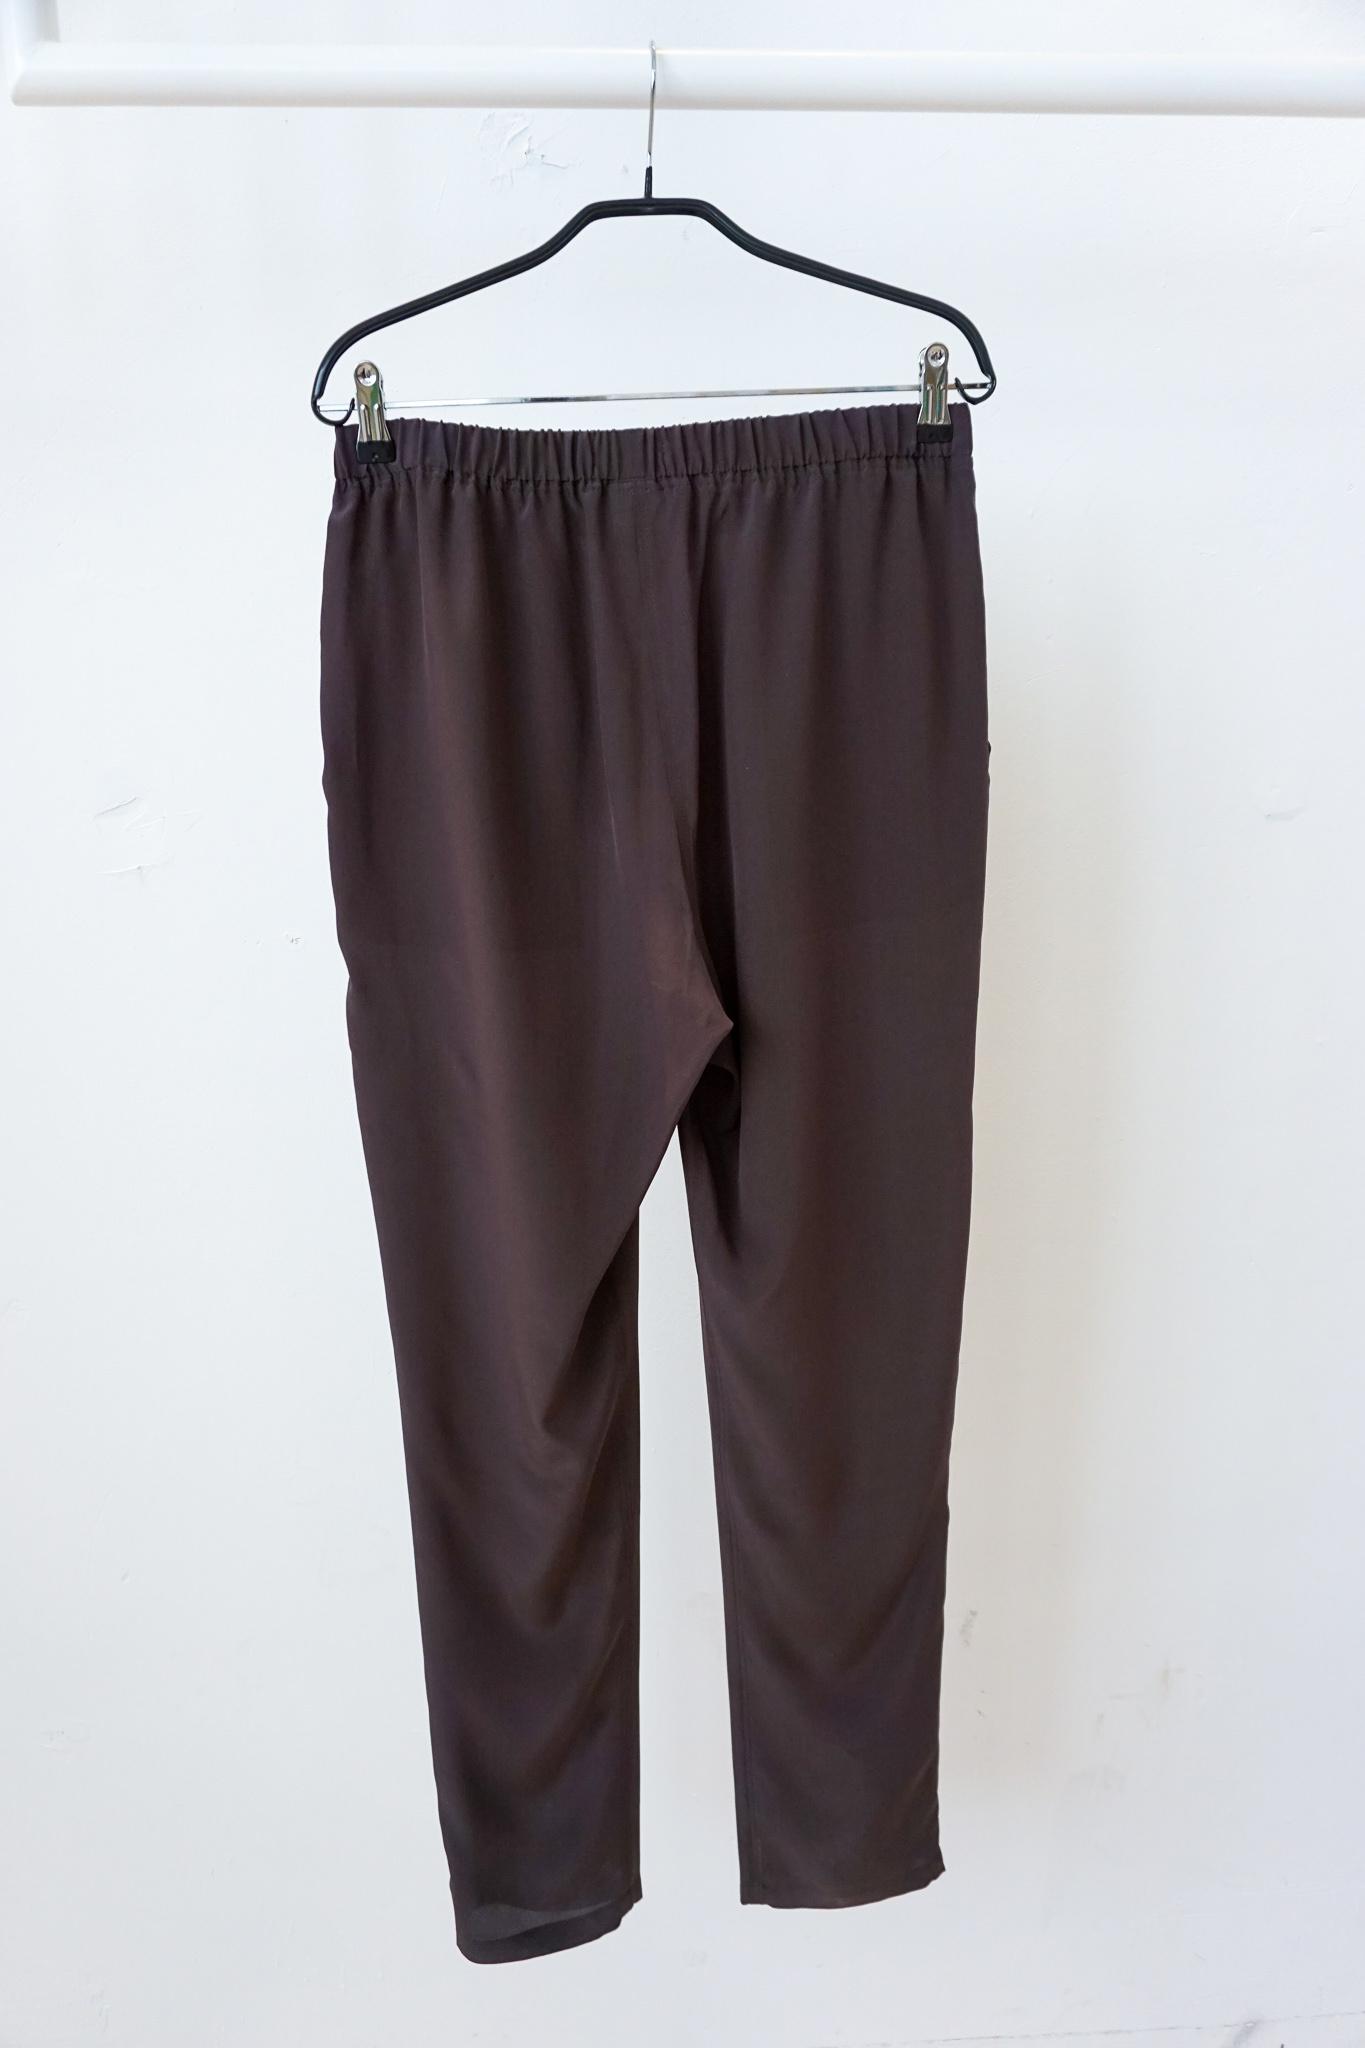 PJ trouser Chocolate silk